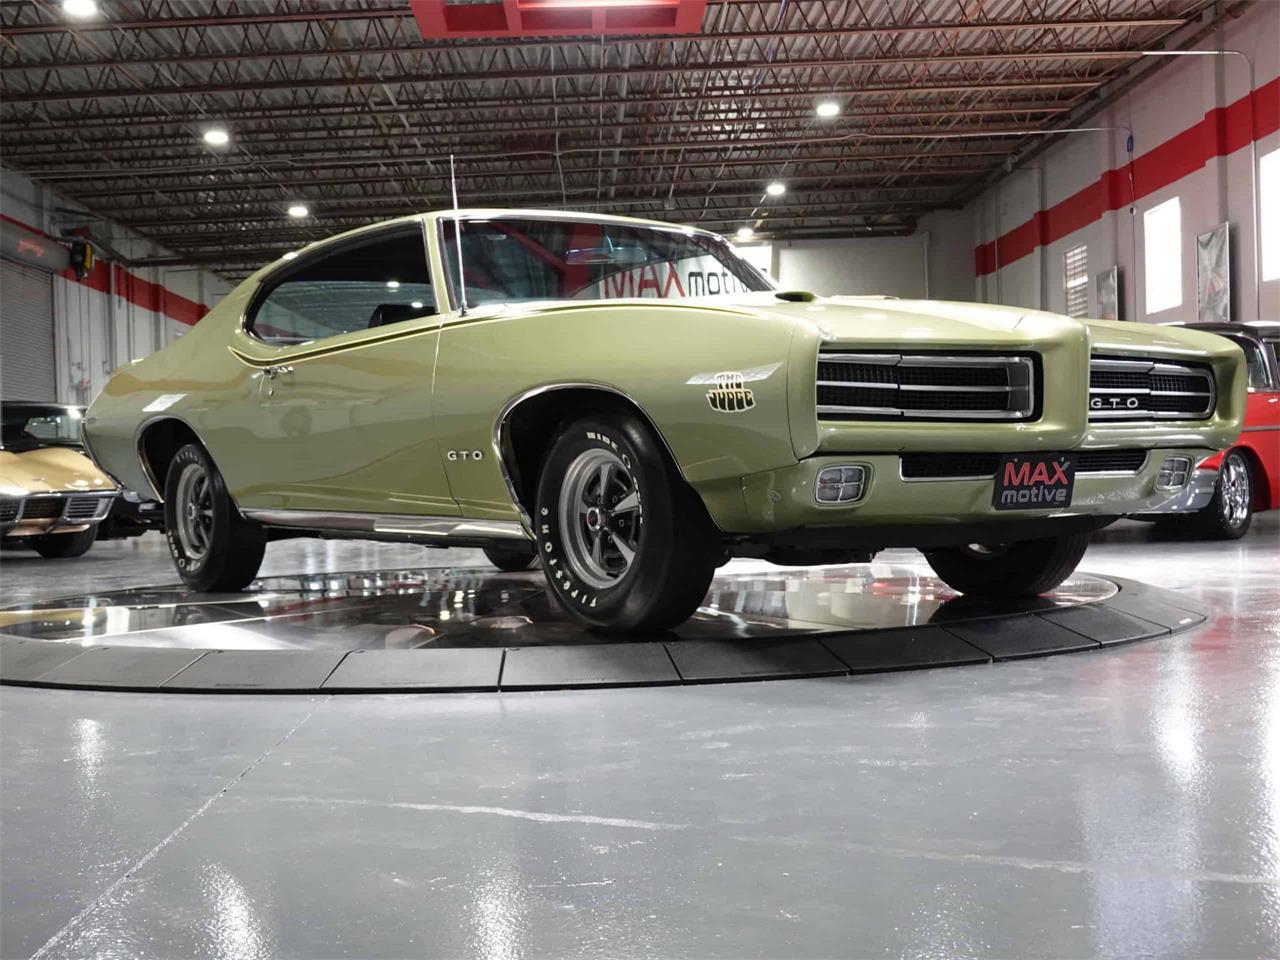 1969 Pontiac GTO (The Judge) (CC-1383094) for sale in Pittsburgh, Pennsylvania